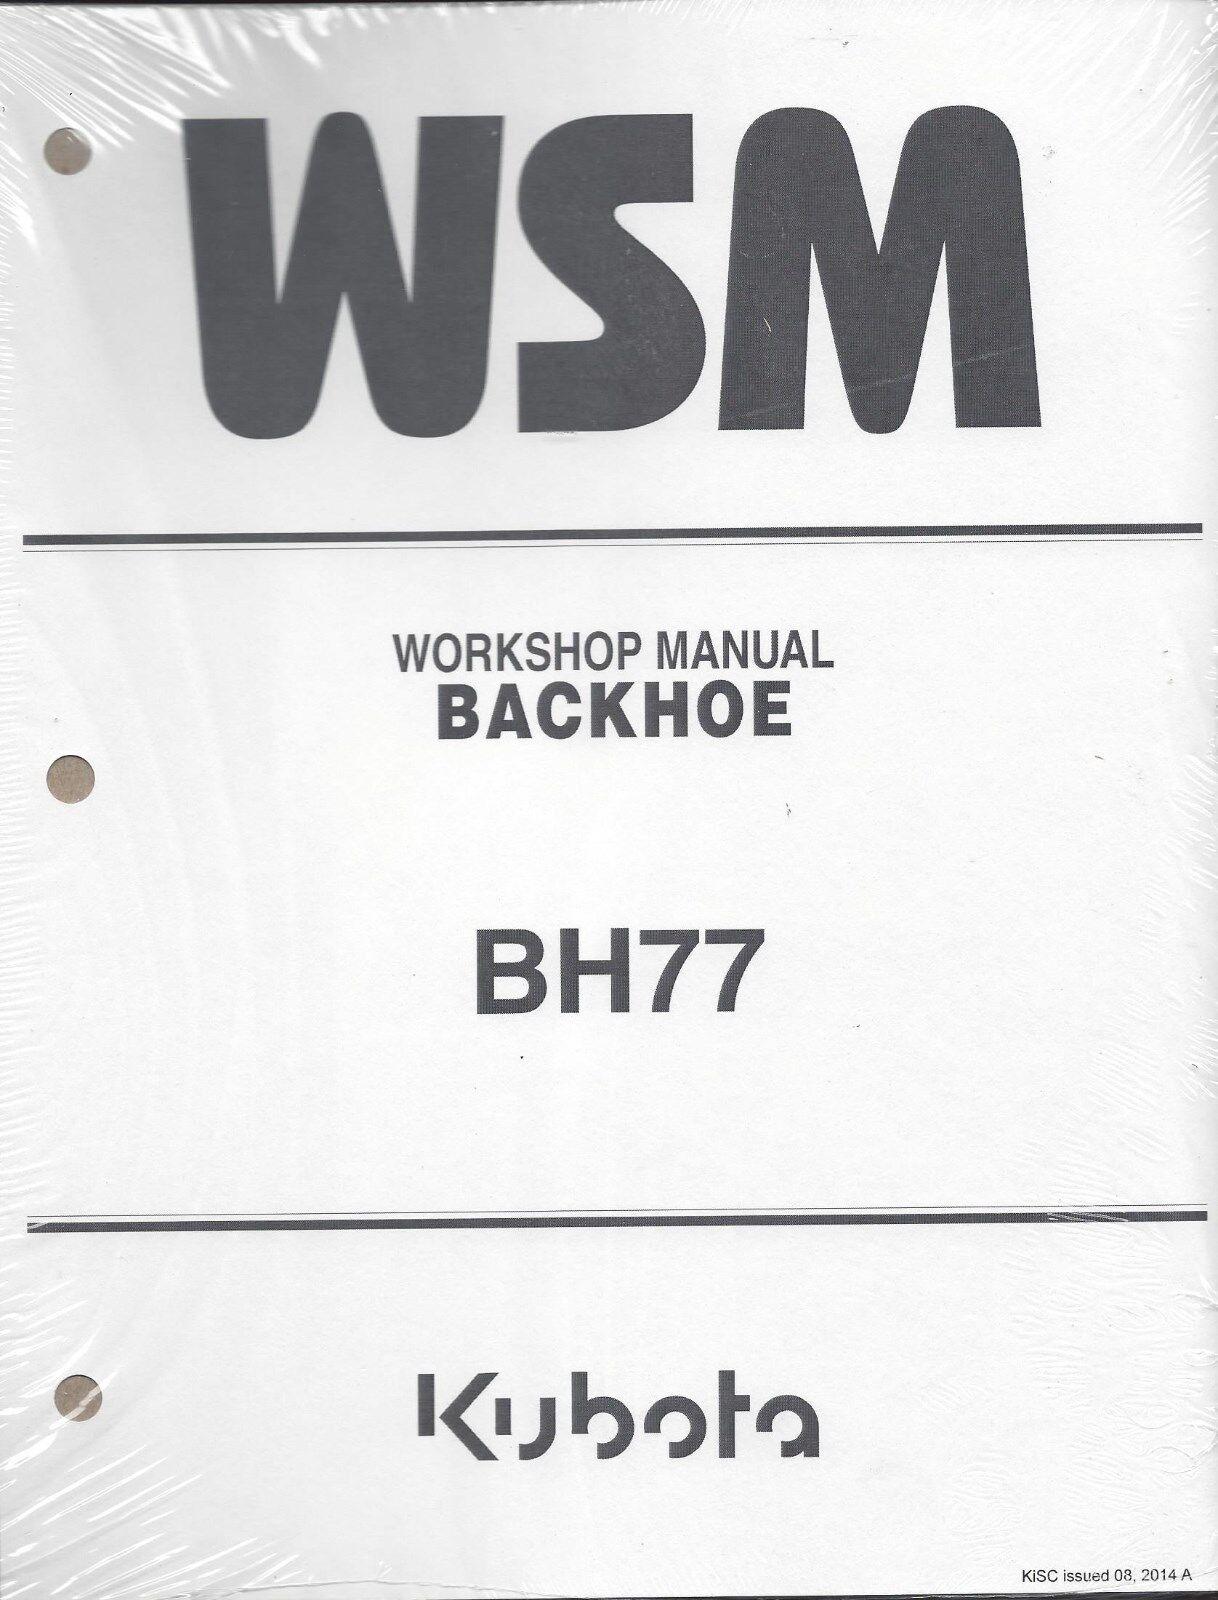 Kubota Bh77 Backhoe Workshop Service Manual